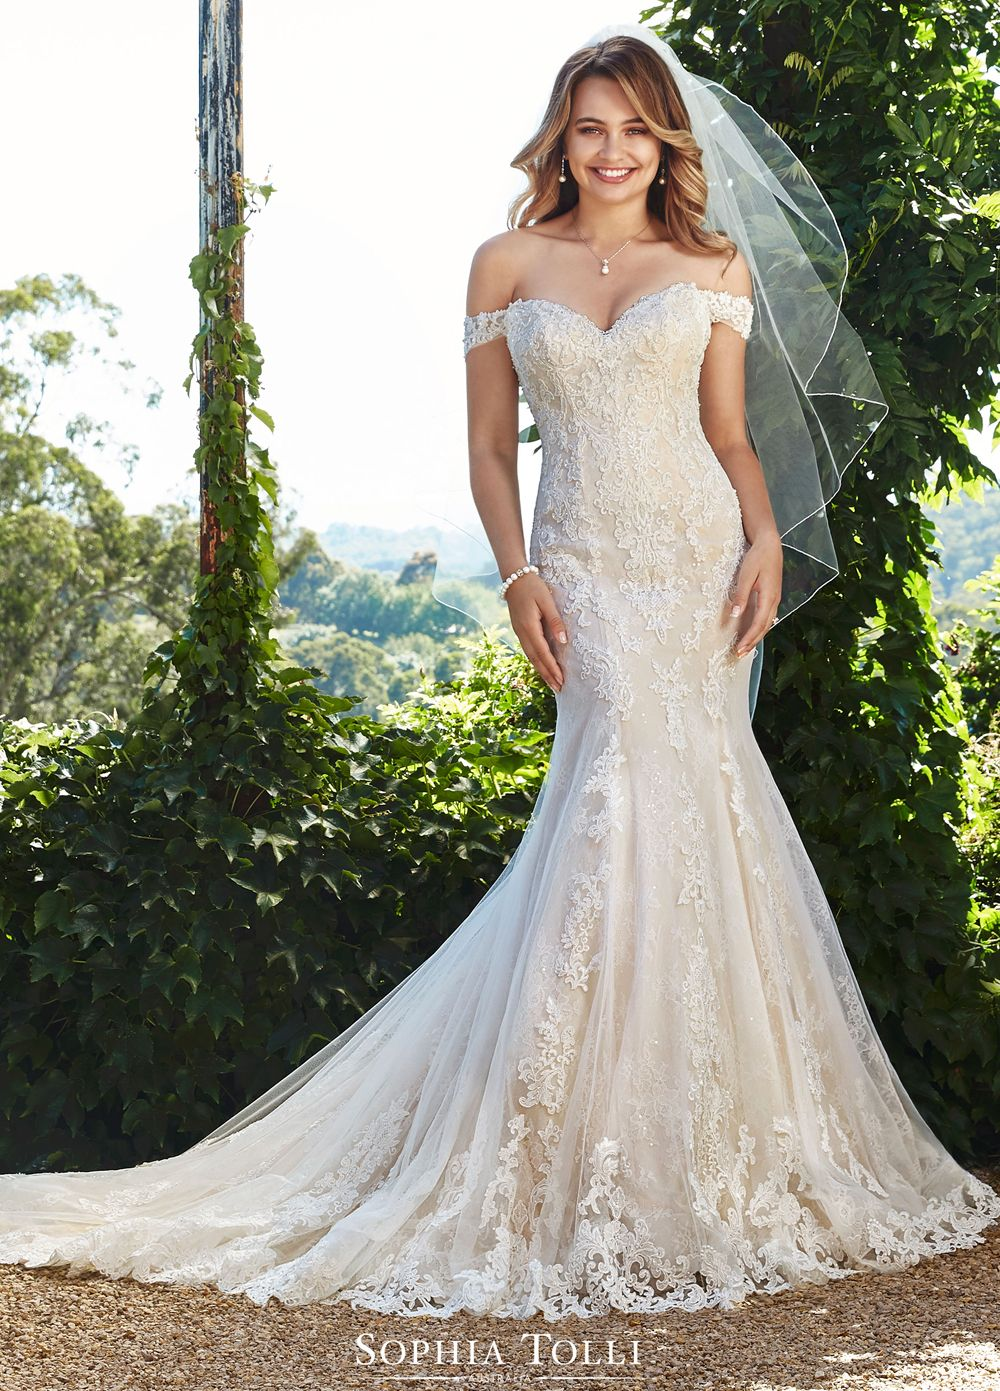 Sophia Tolli Y18 Kacey Sweetheart Neckline Wedding Dress in ...